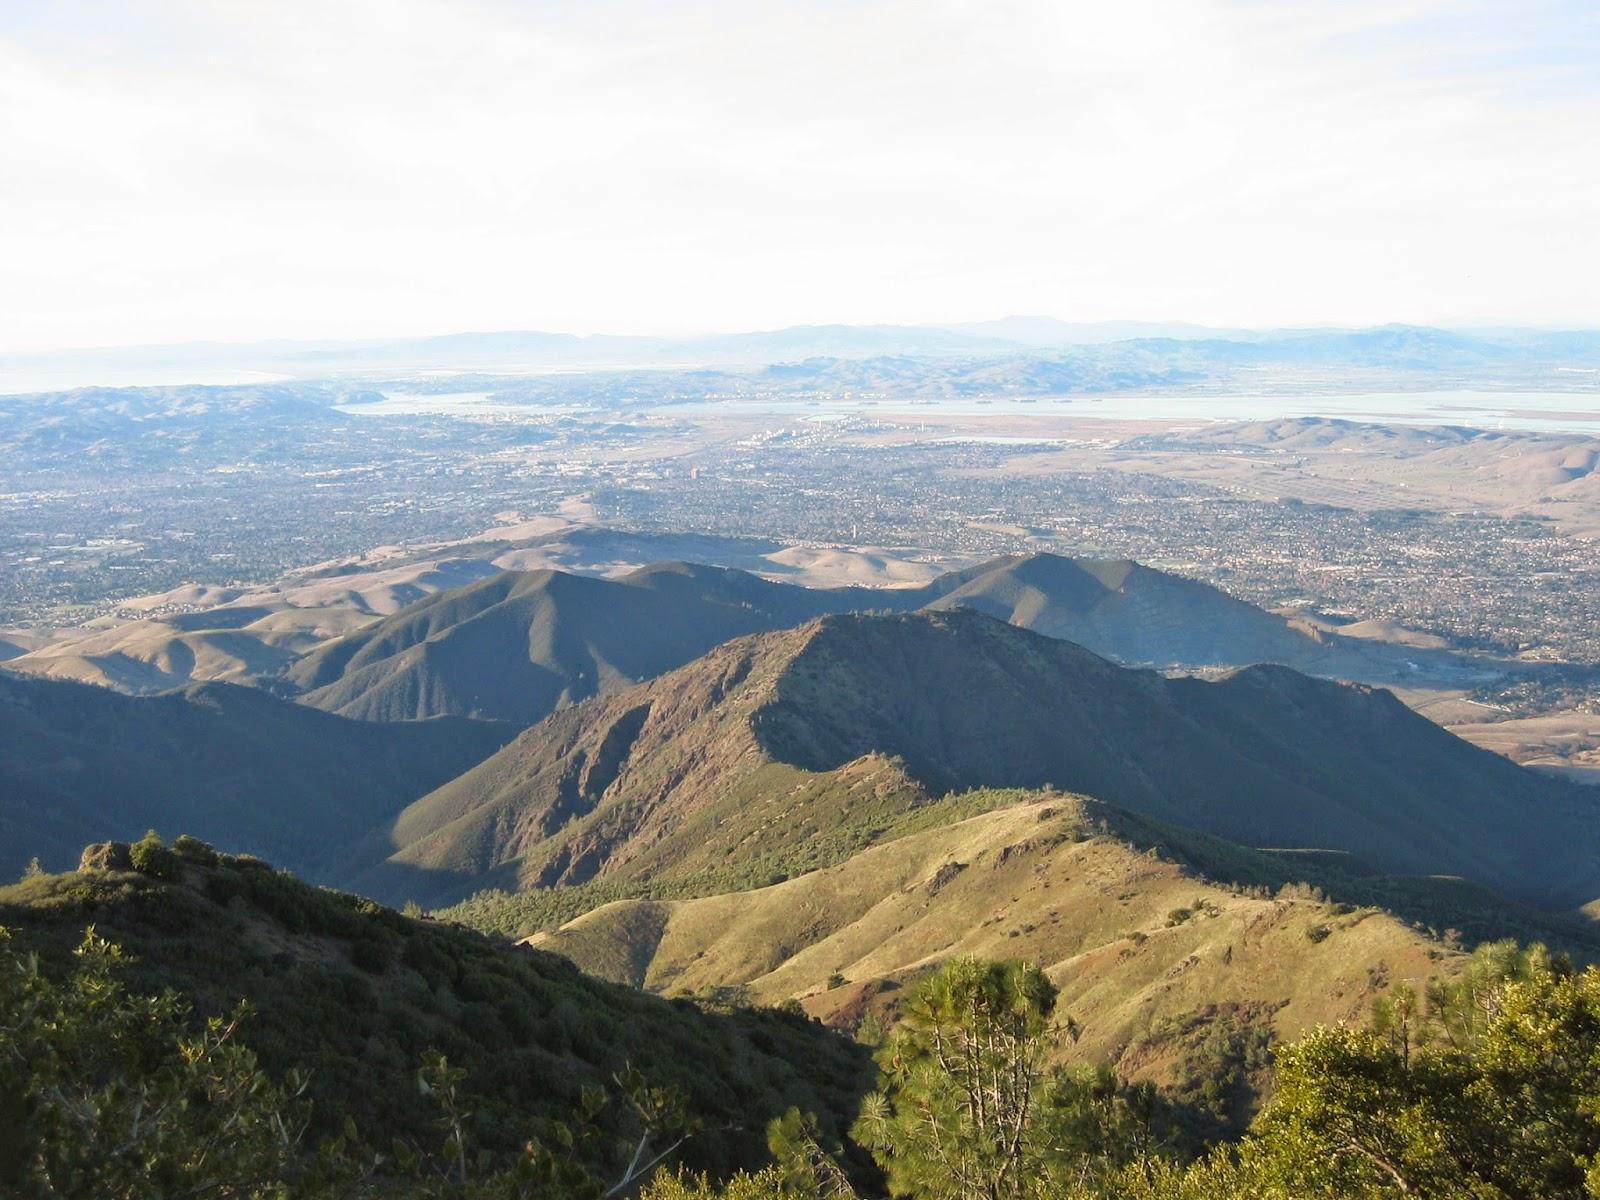 San Francisco East Bay view Mt. Diablo California by Rachel Medanic